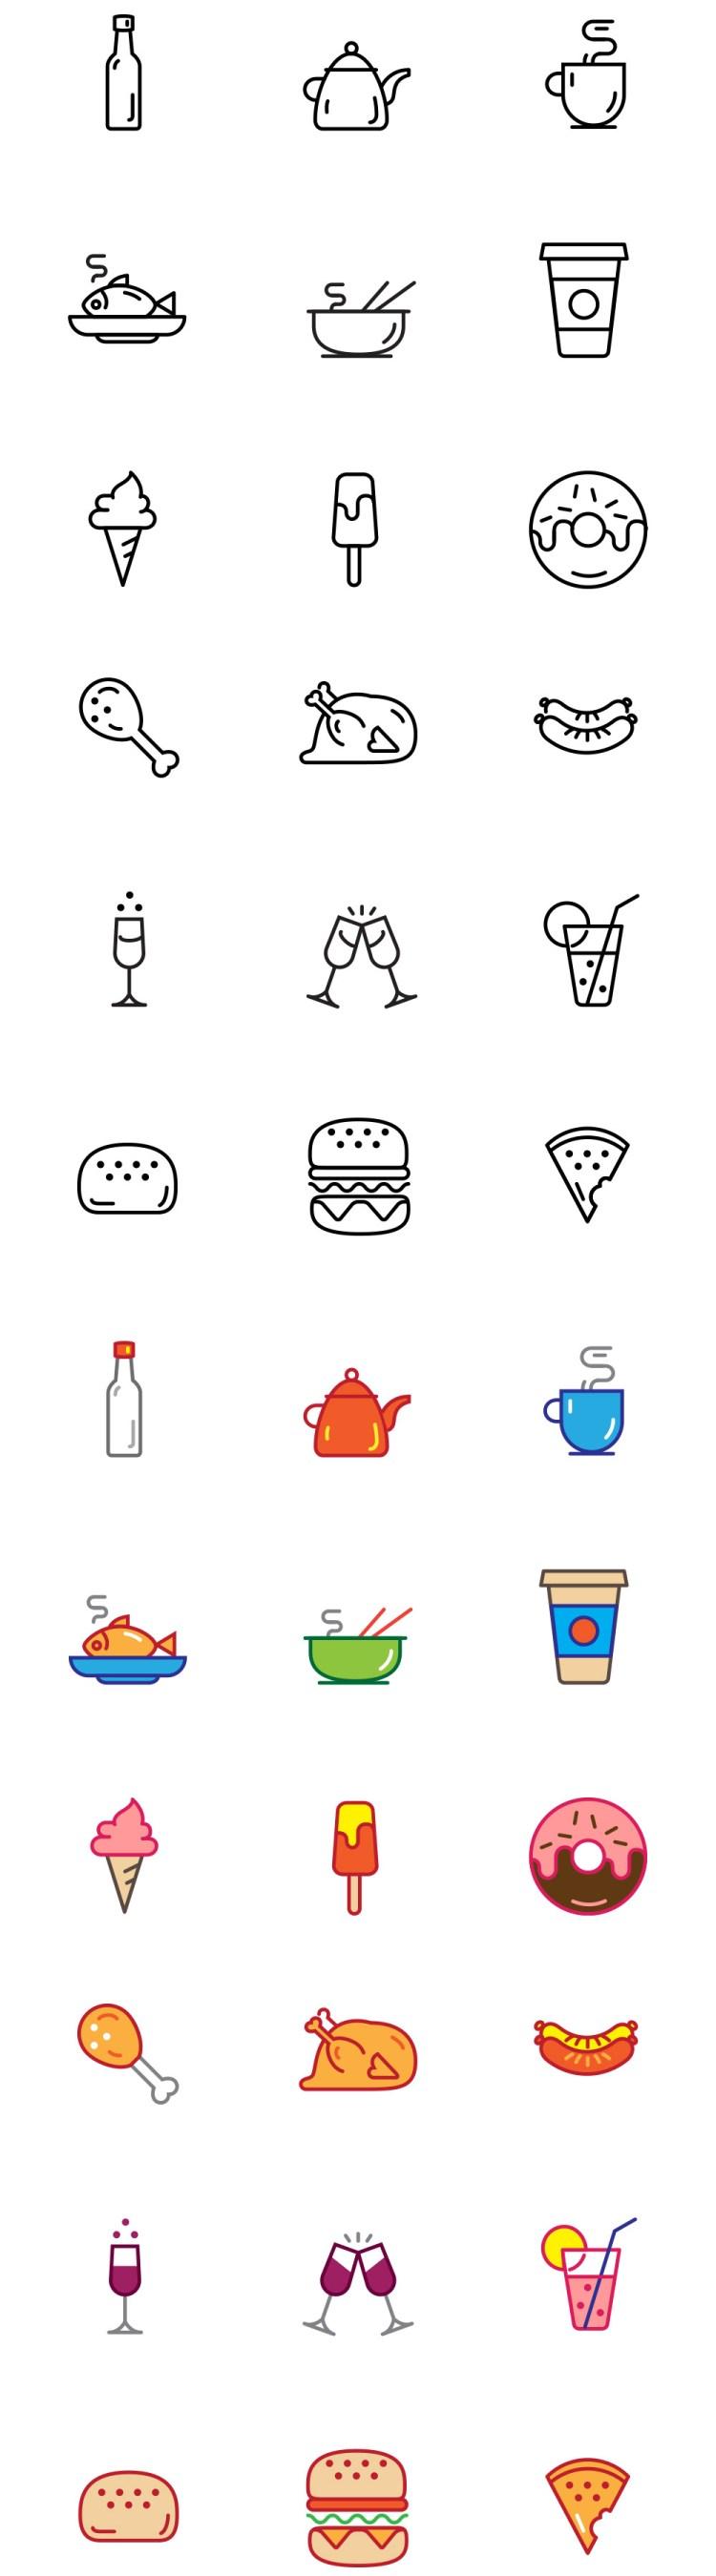 iconos-comida-gratis